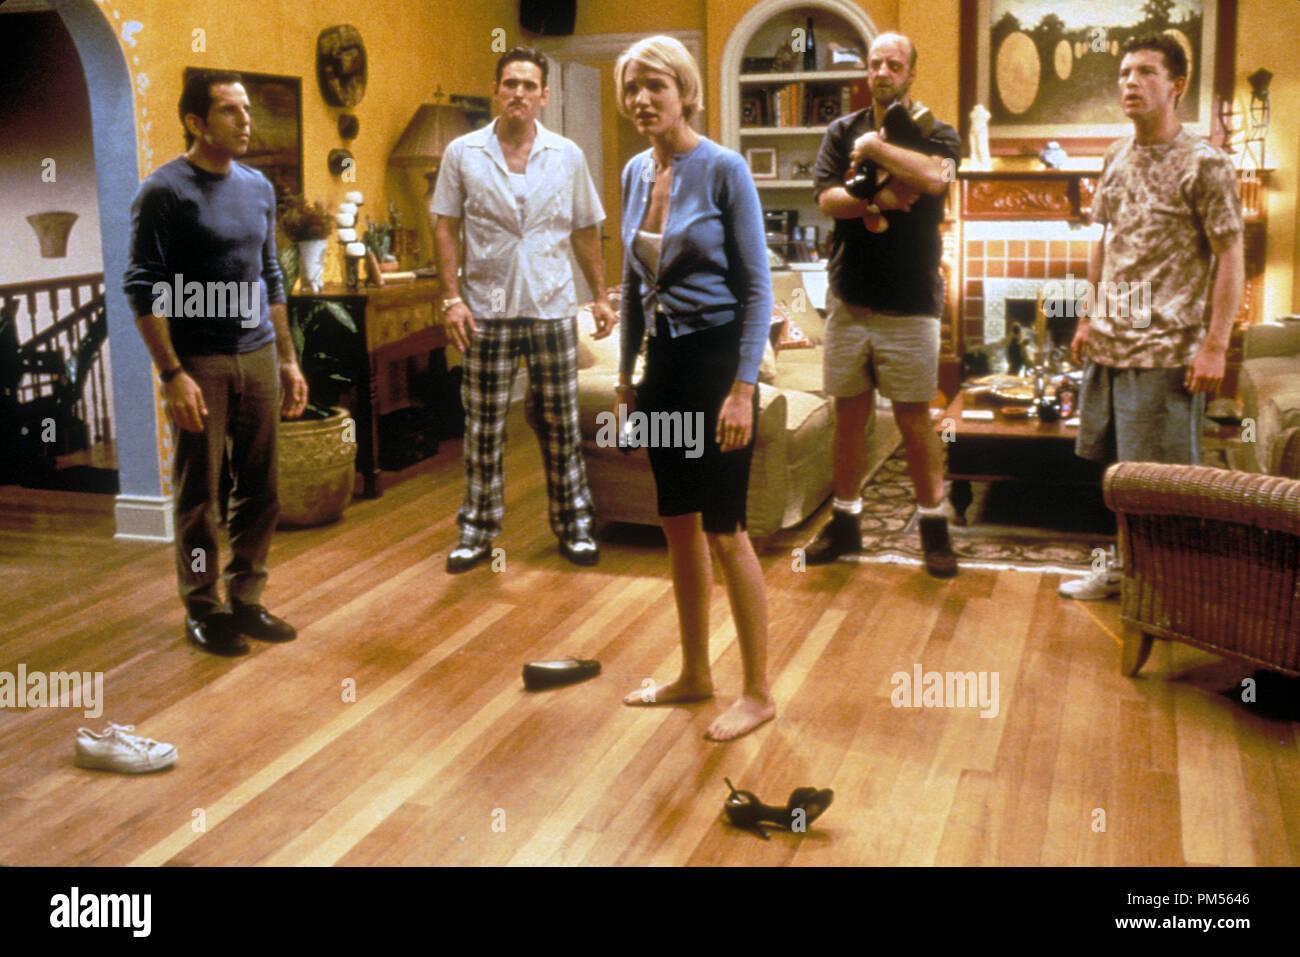 'There's Something About Mary' 1998 Ben Stiller, Matt Dillon, Cameron Diaz, Chris Elliot, Lee Evans - Stock Image